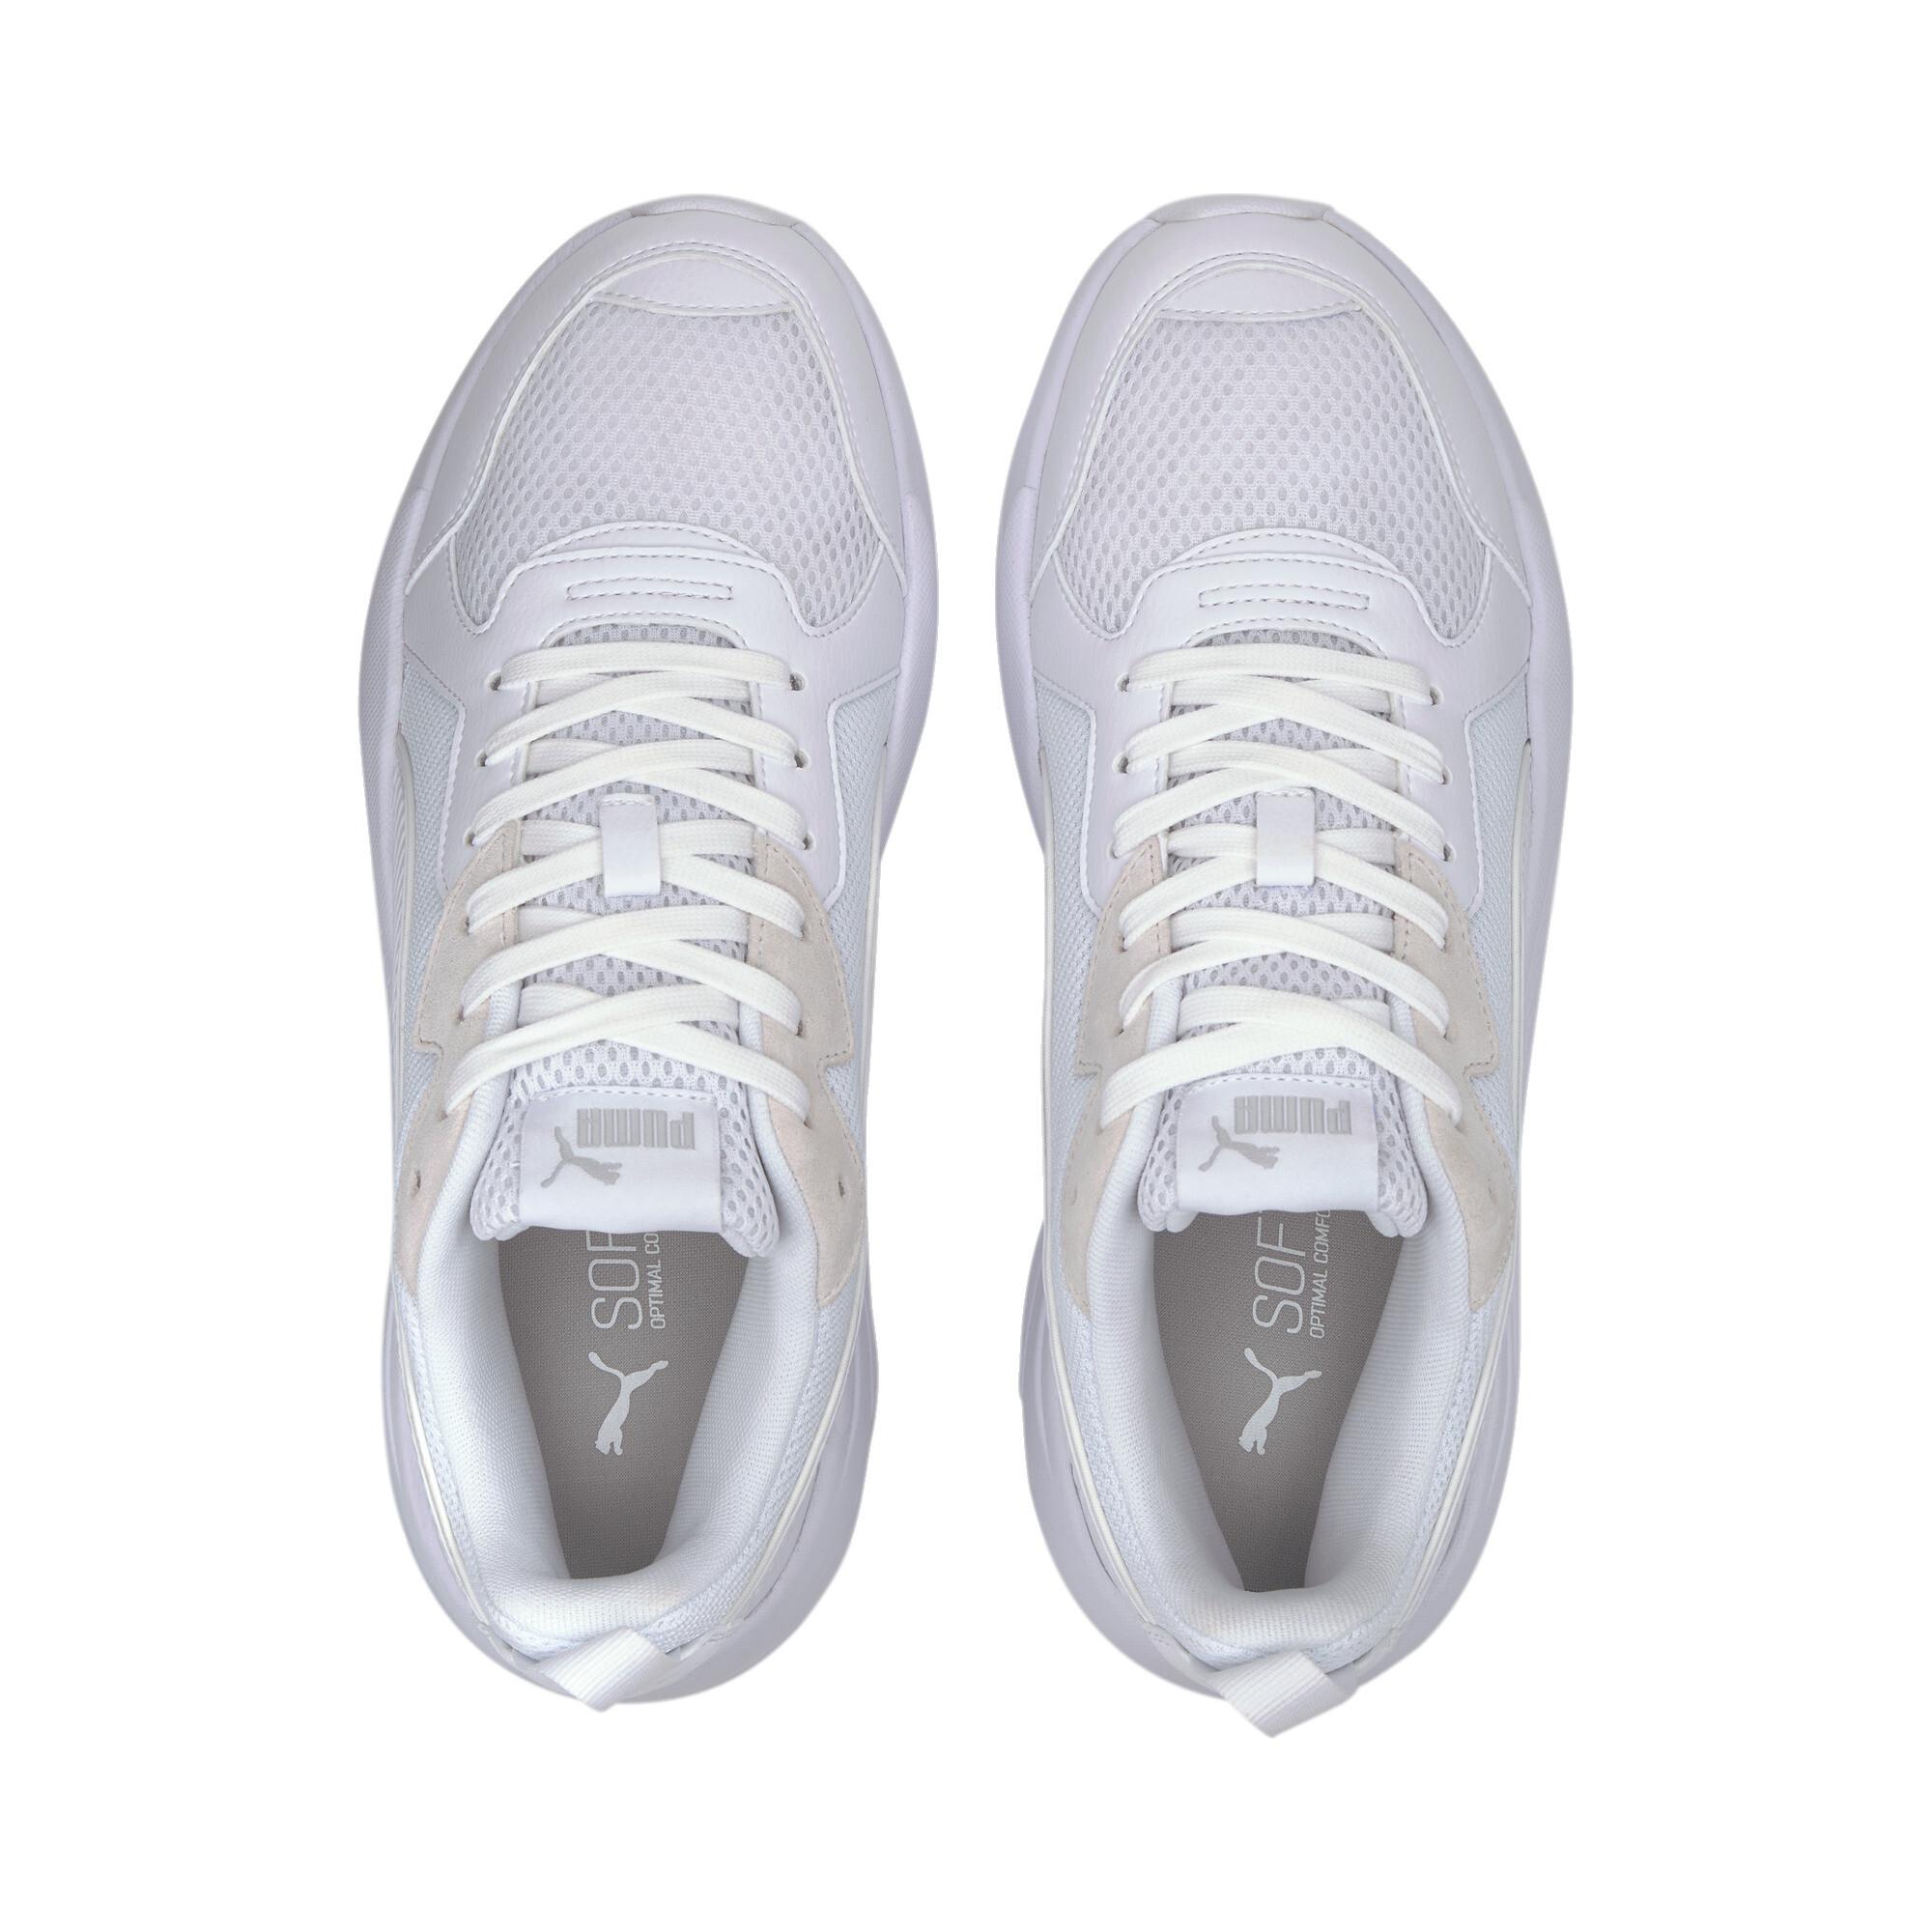 PUMA-Men-039-s-X-RAY-Sneakers thumbnail 27